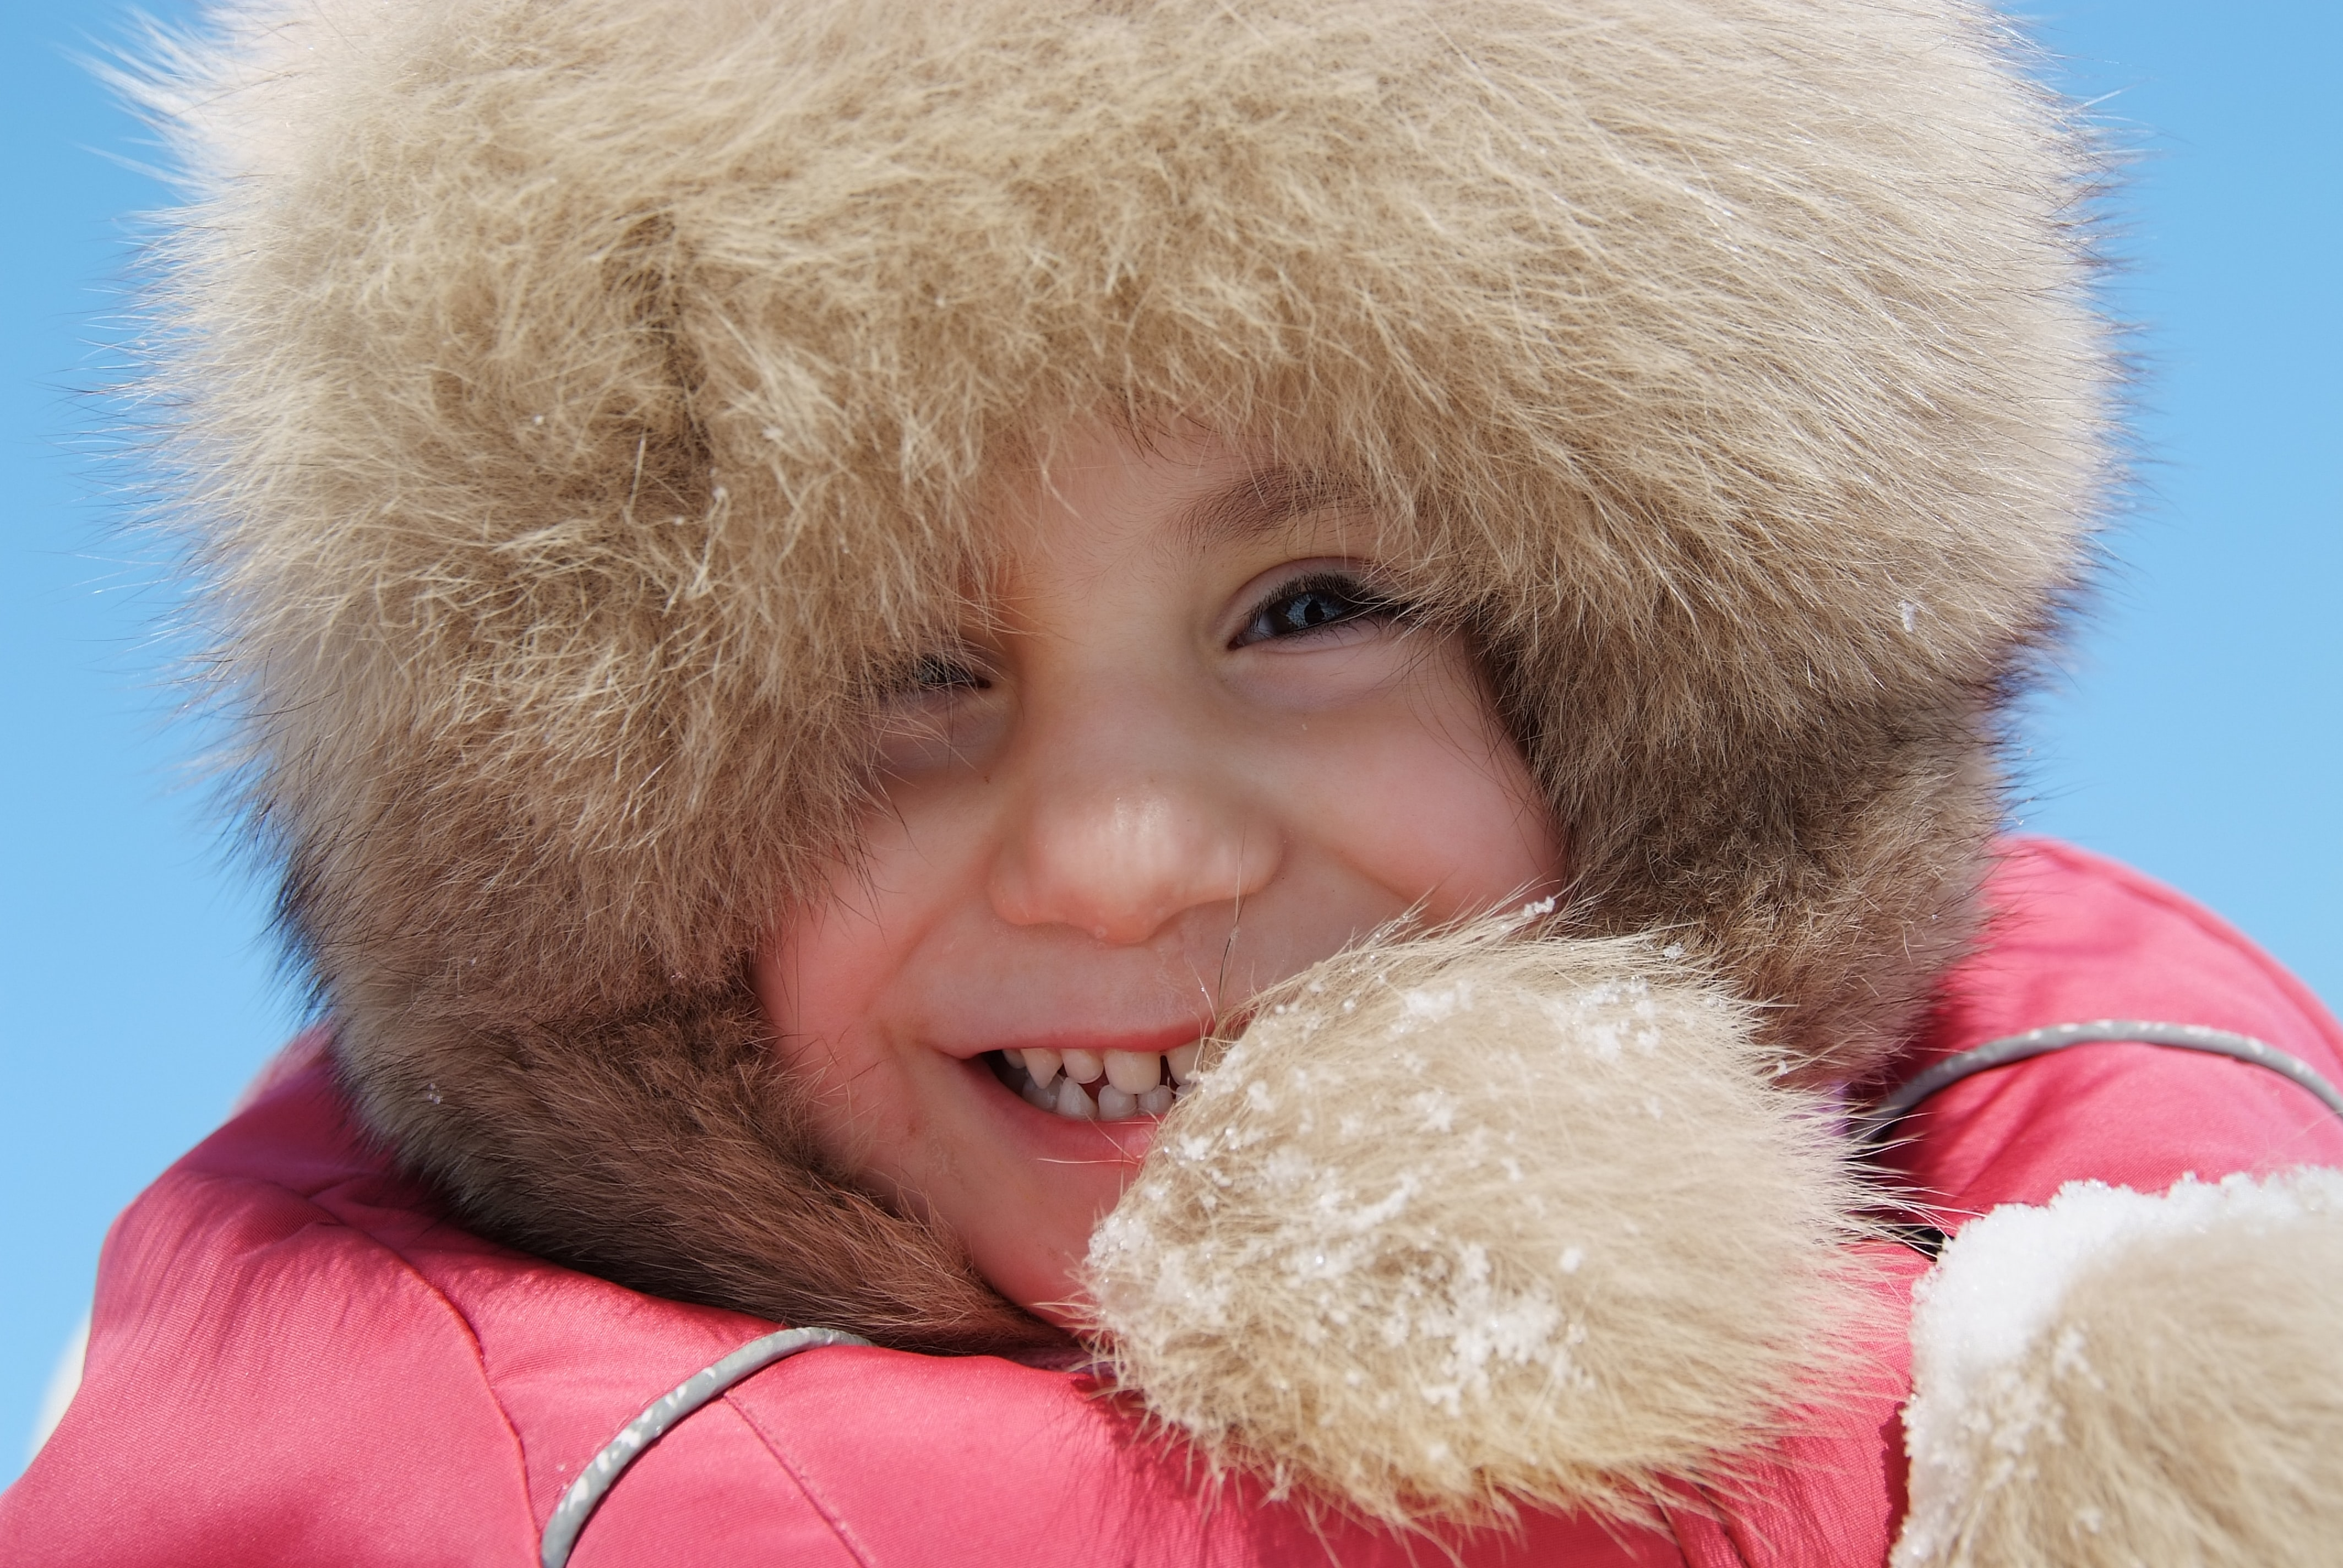 girl in pink and brown fur coat smiling